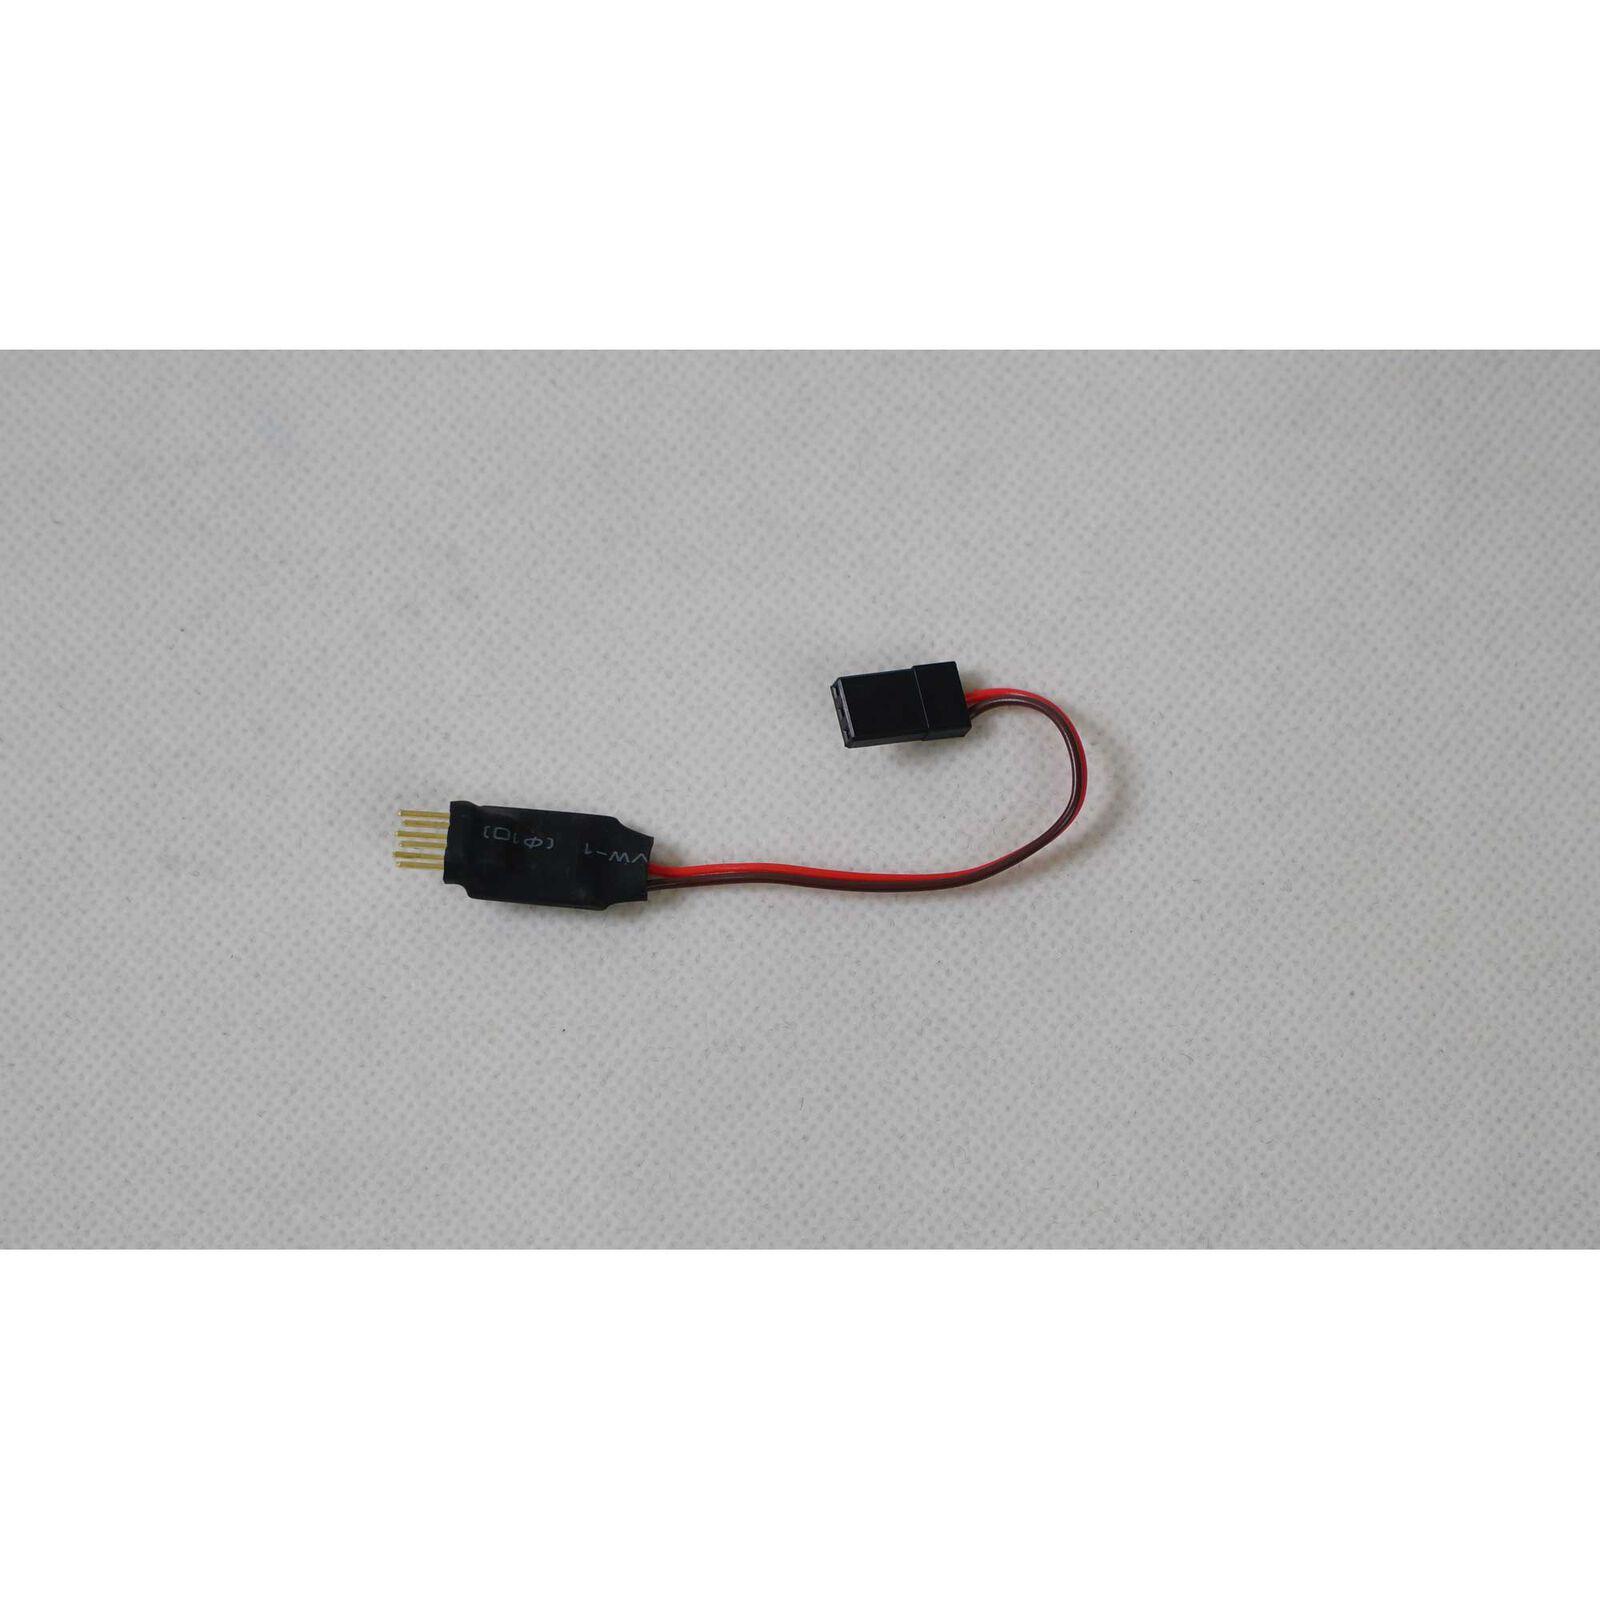 LED Controller: CJ-6 V2